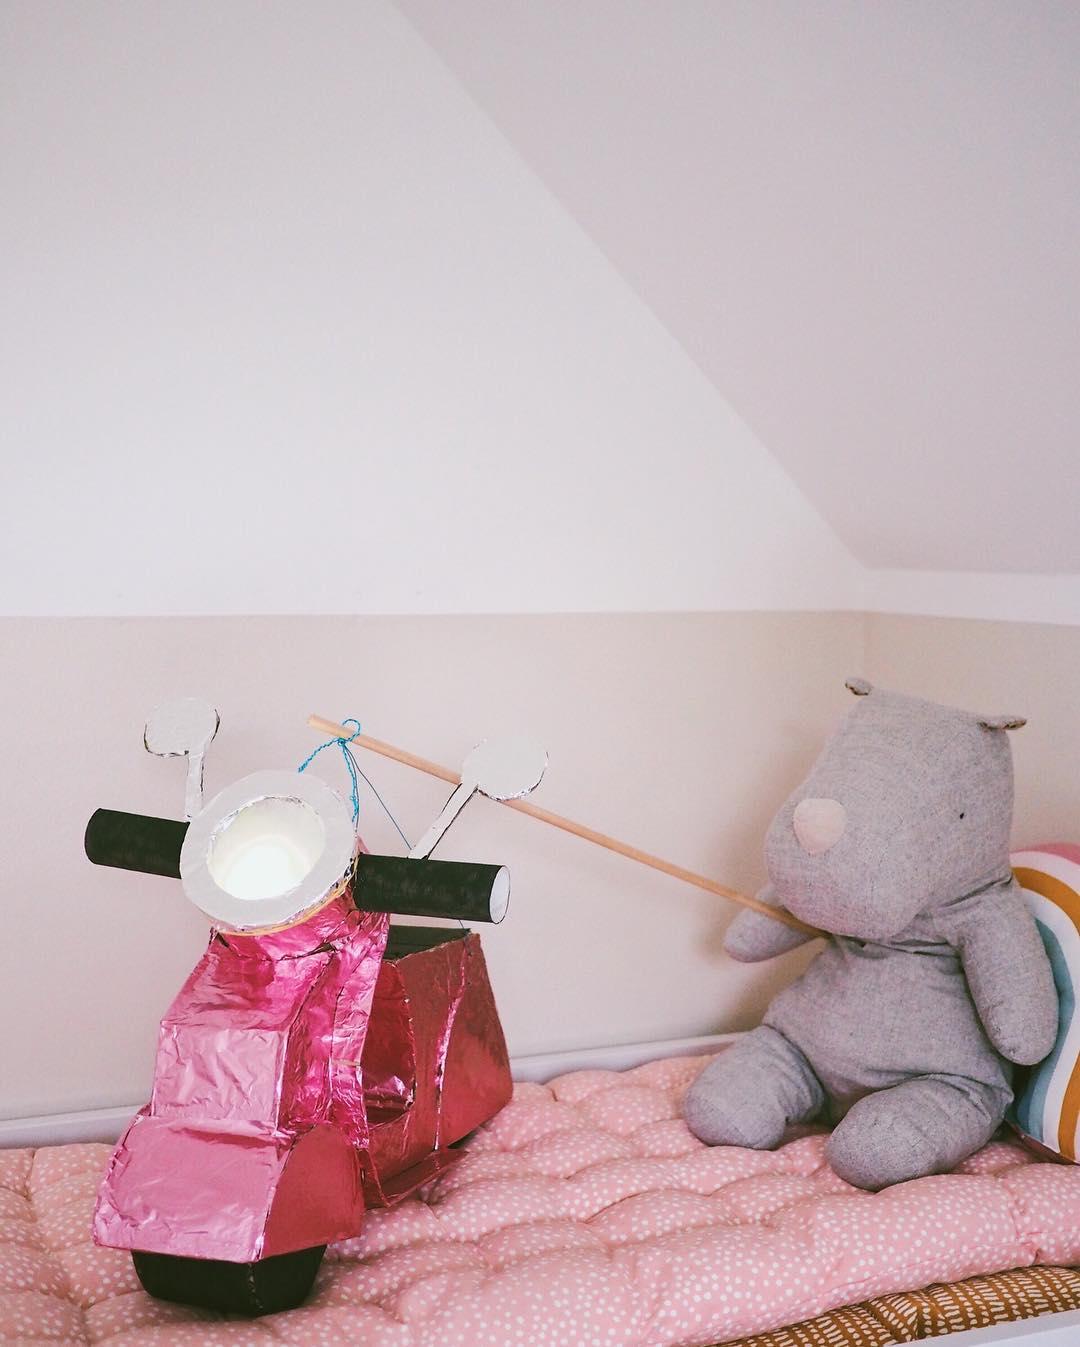 Laterne basteln mit Kartons - Basteln mit Kindern - Bastelidee Laterne Vespa selbstgemacht